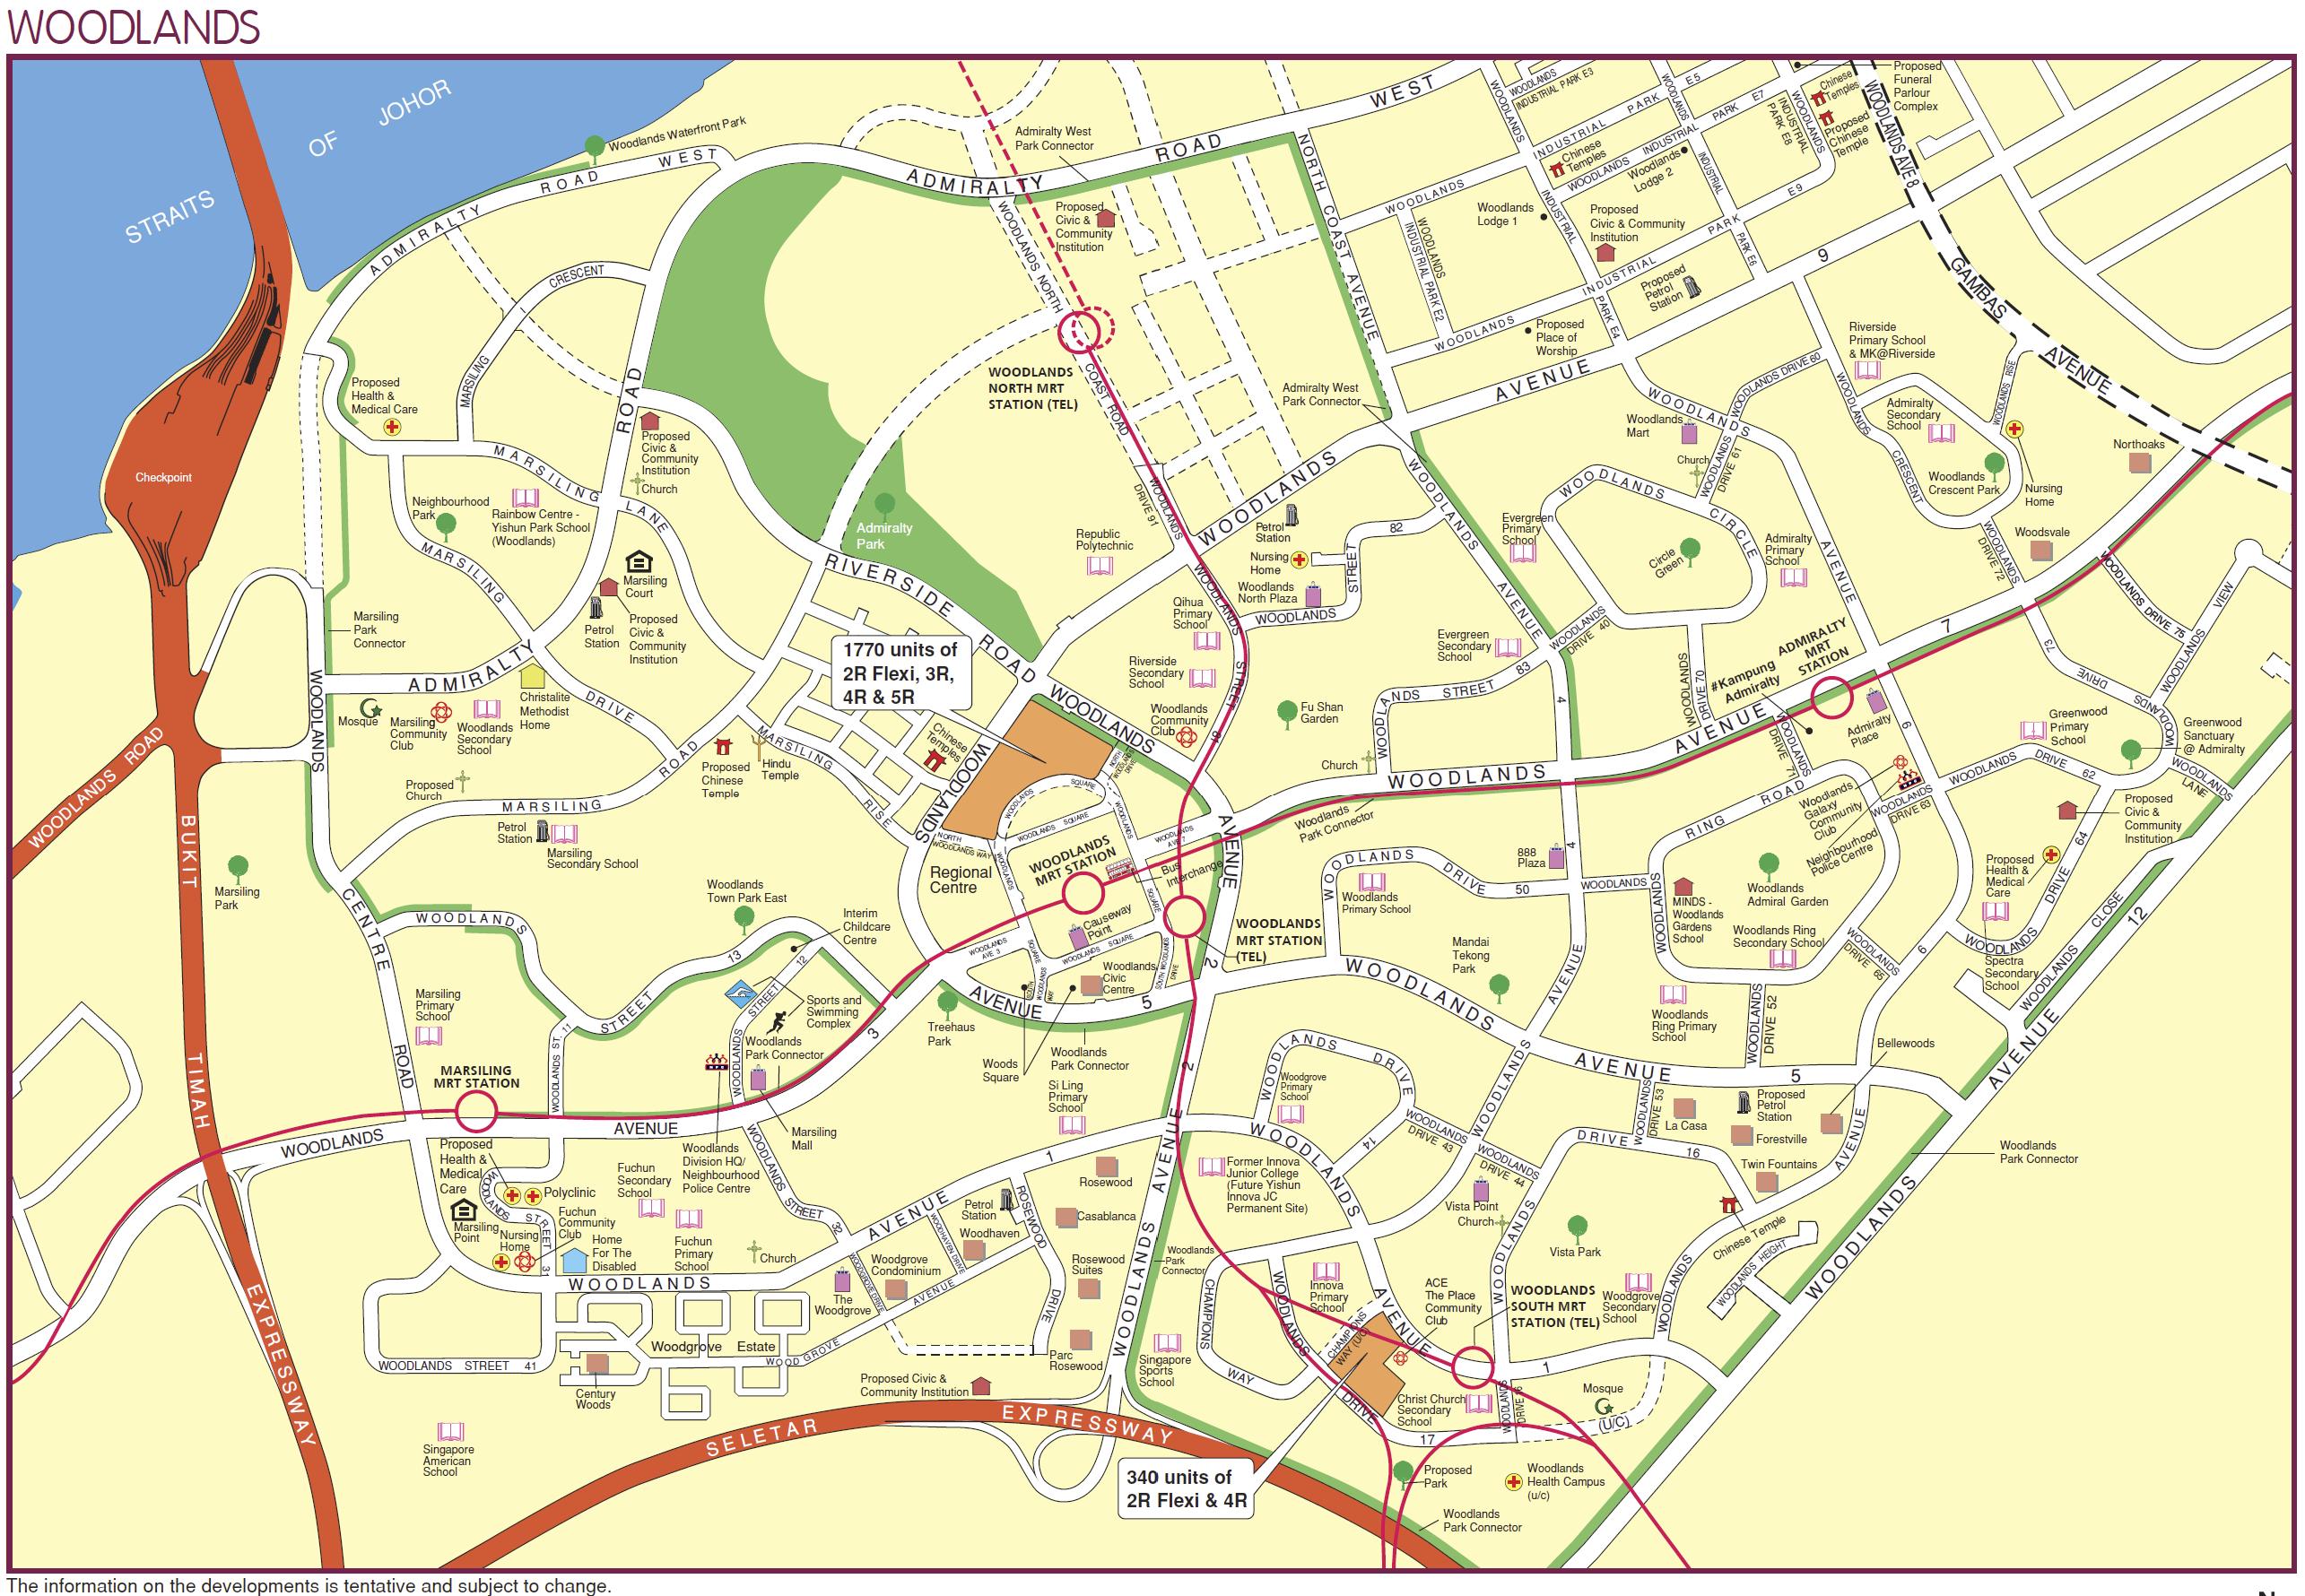 woodlands hdb bto august 2020 map